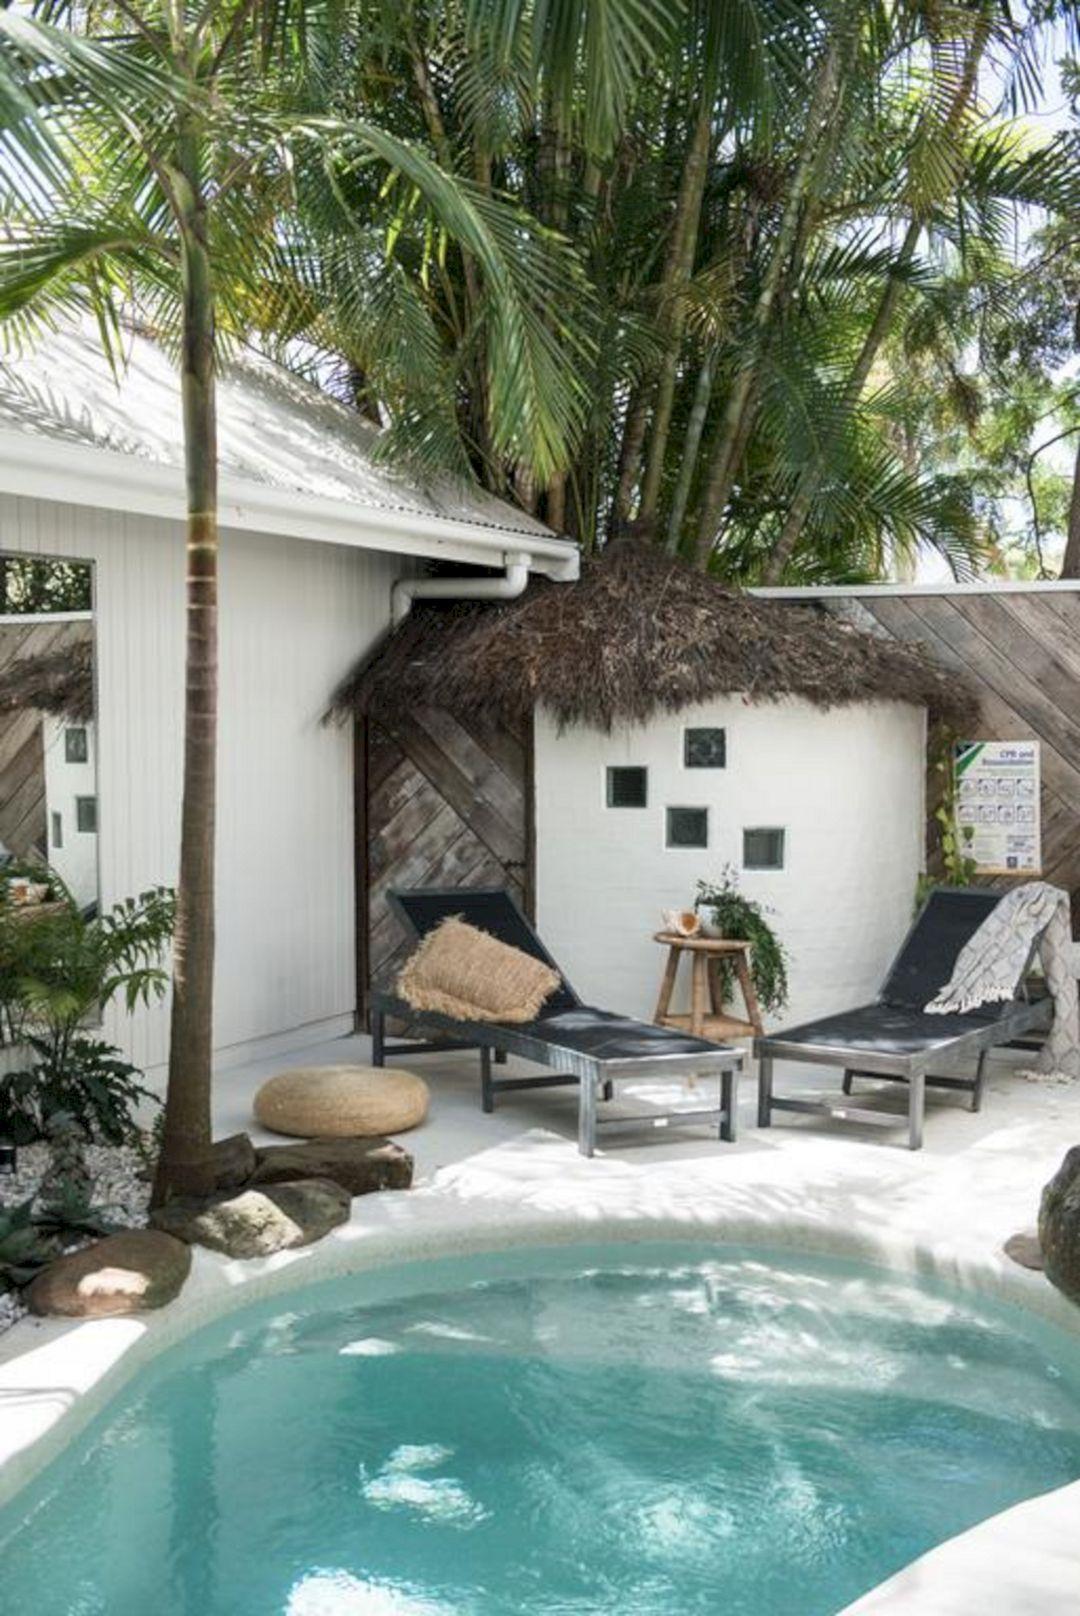 Outstanding 75 Best Inspirations Wonderful Outdoor Pool Decorations Ideas Http Goodsgn Com Design Decora Beach House Interior Outdoor Pool Decor Pool Decor